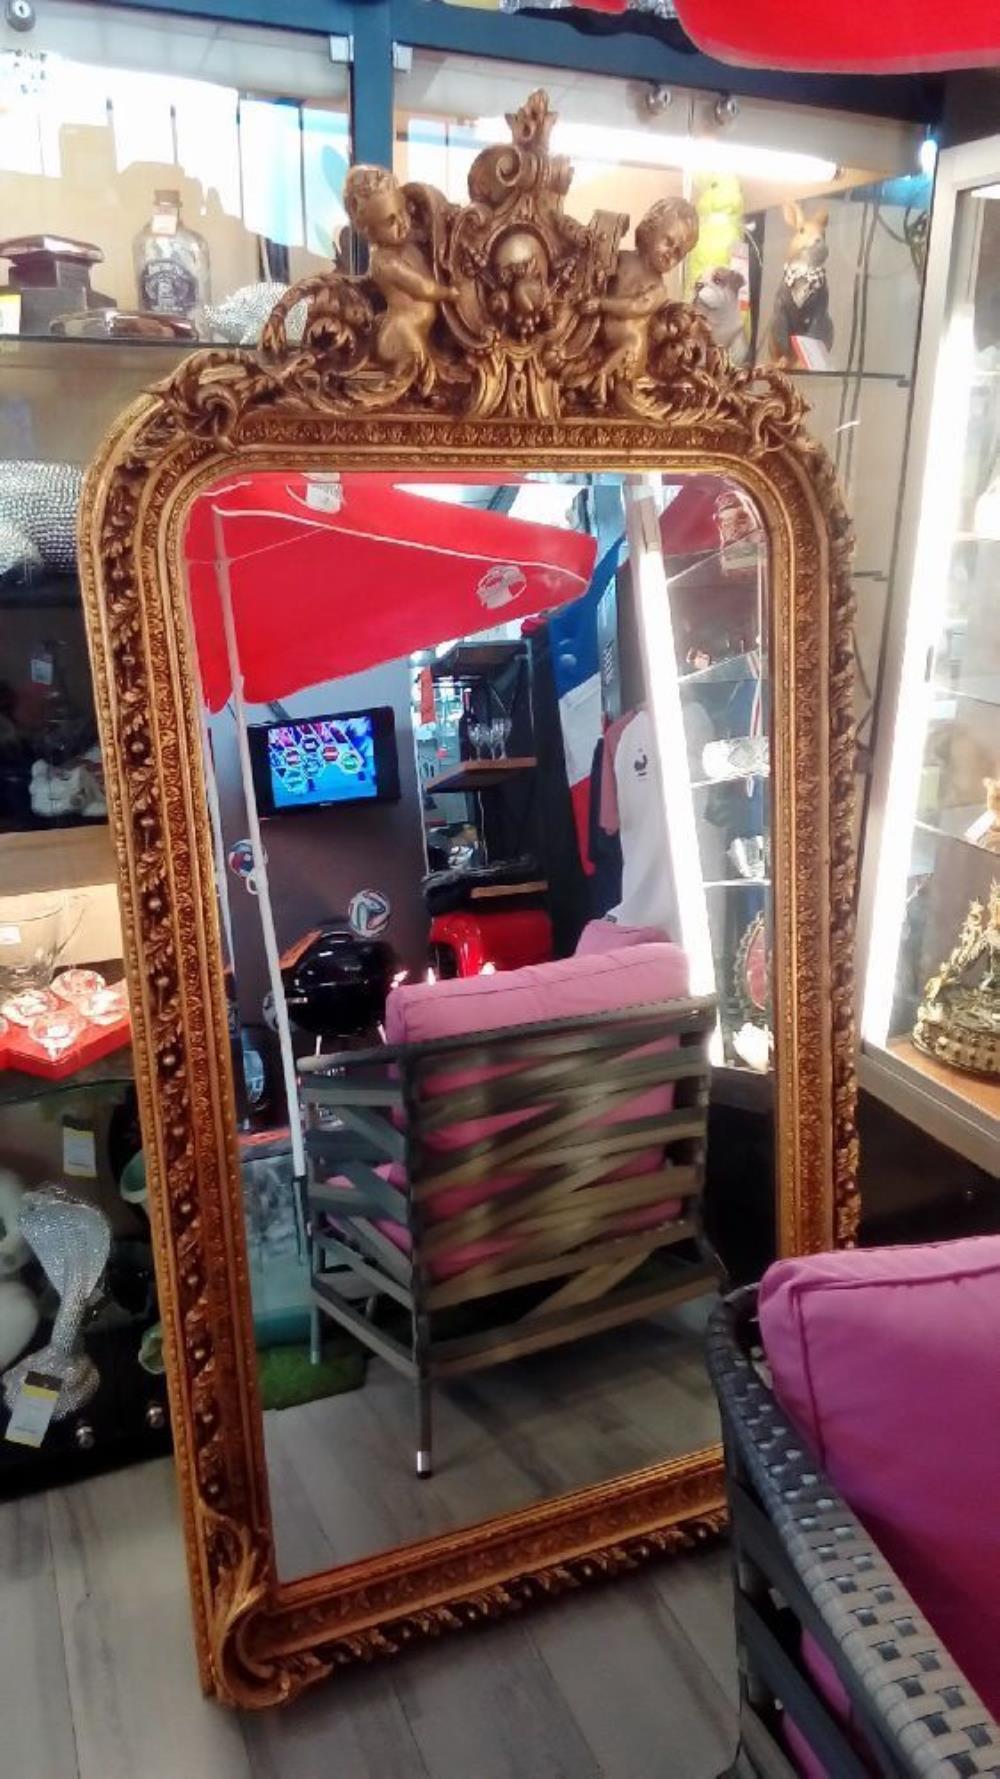 miroir dore biseaute occasion troc richwiller. Black Bedroom Furniture Sets. Home Design Ideas